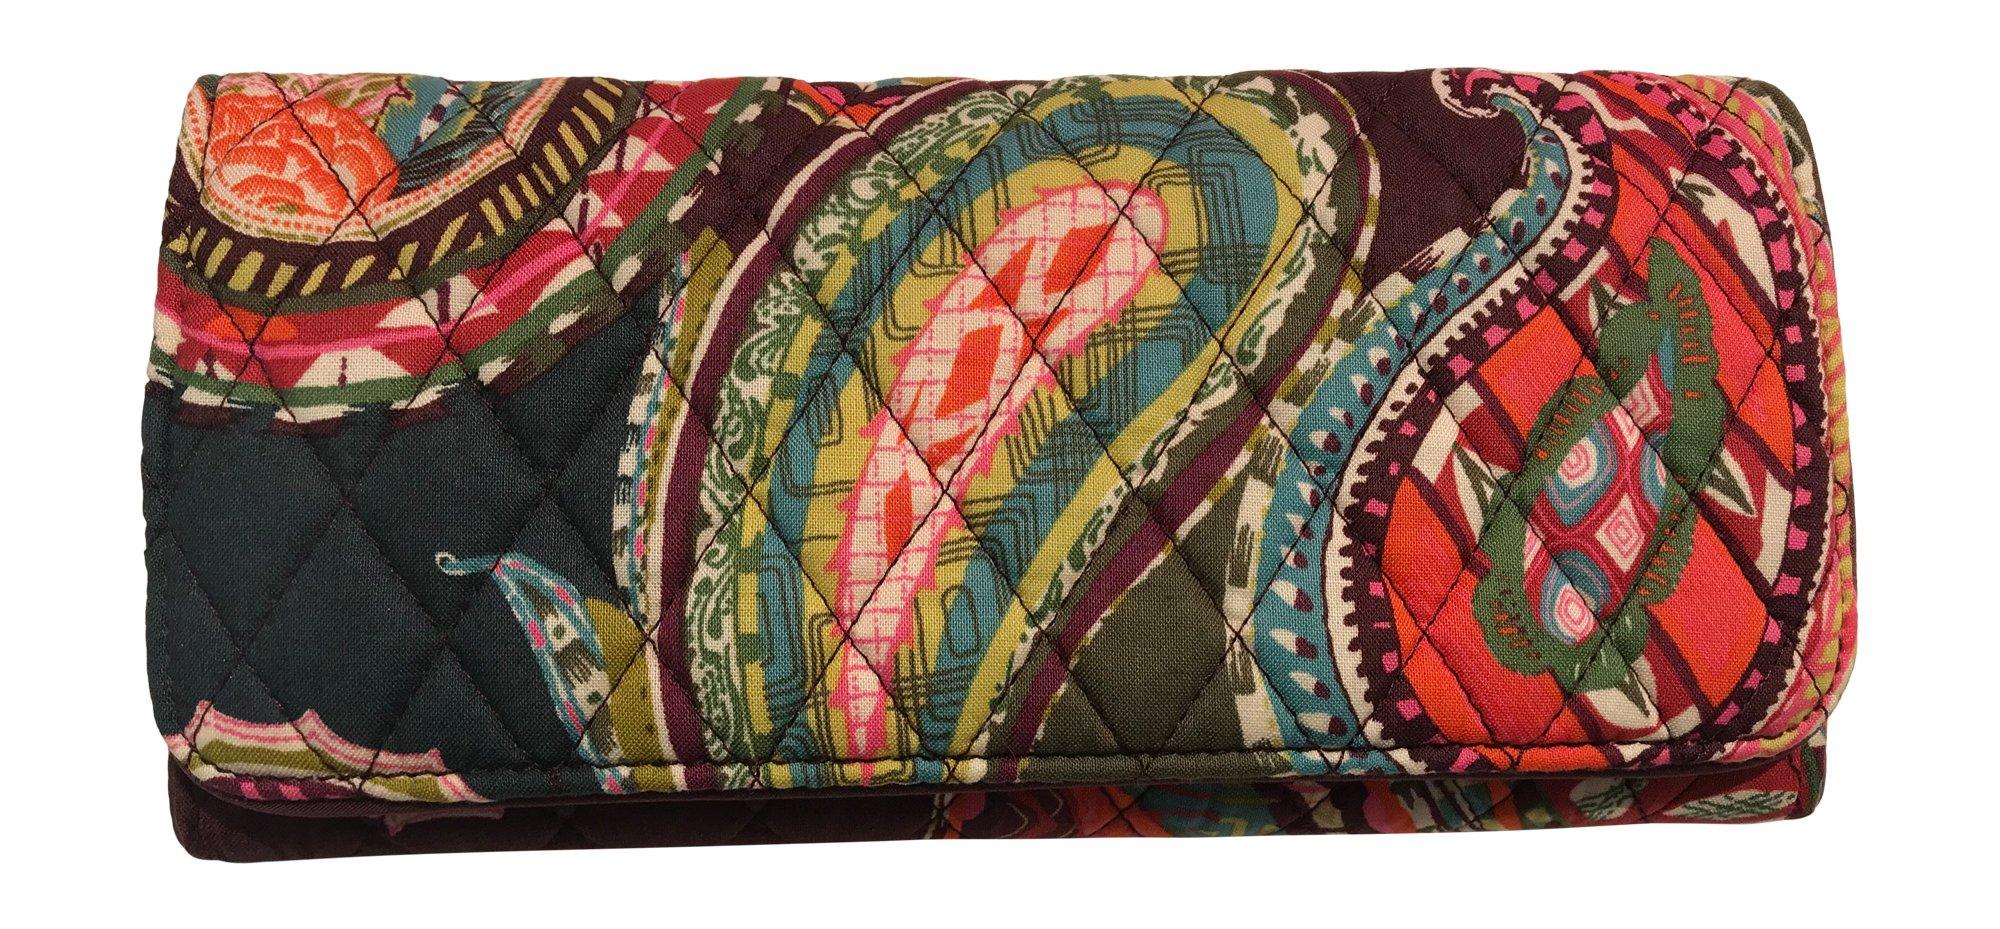 Vera Bradley RFID Trifold Wallet (Heirloom Paisley)